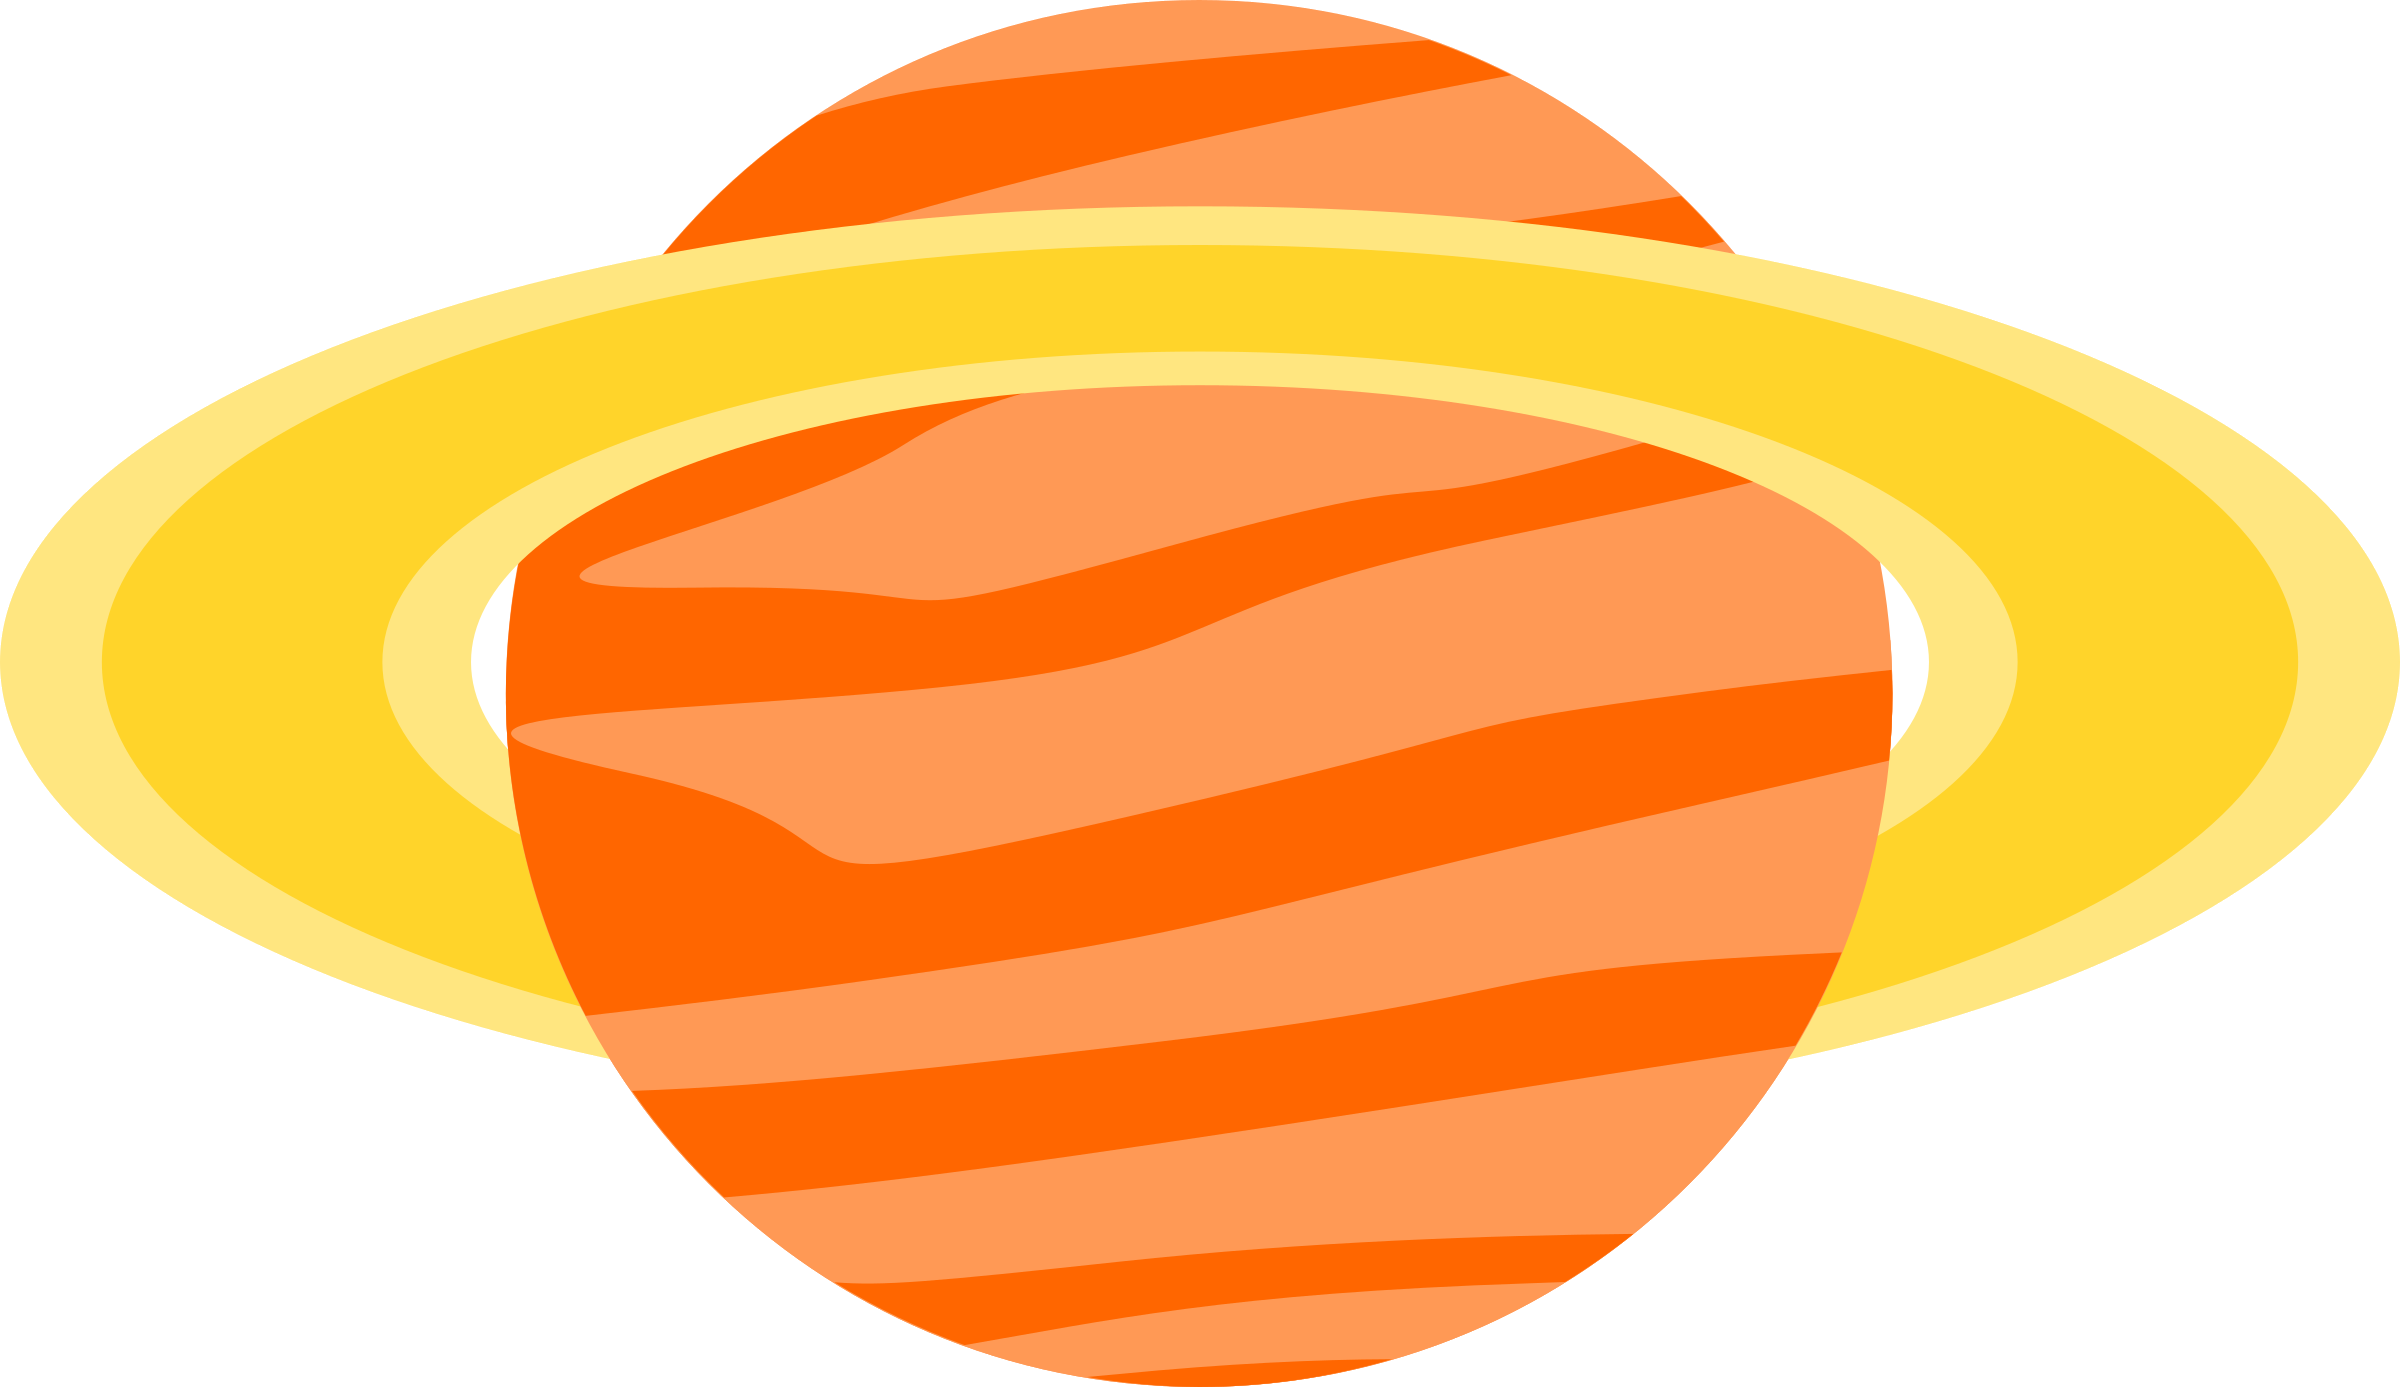 Planeten clipart starveyors. Galactic planet free on